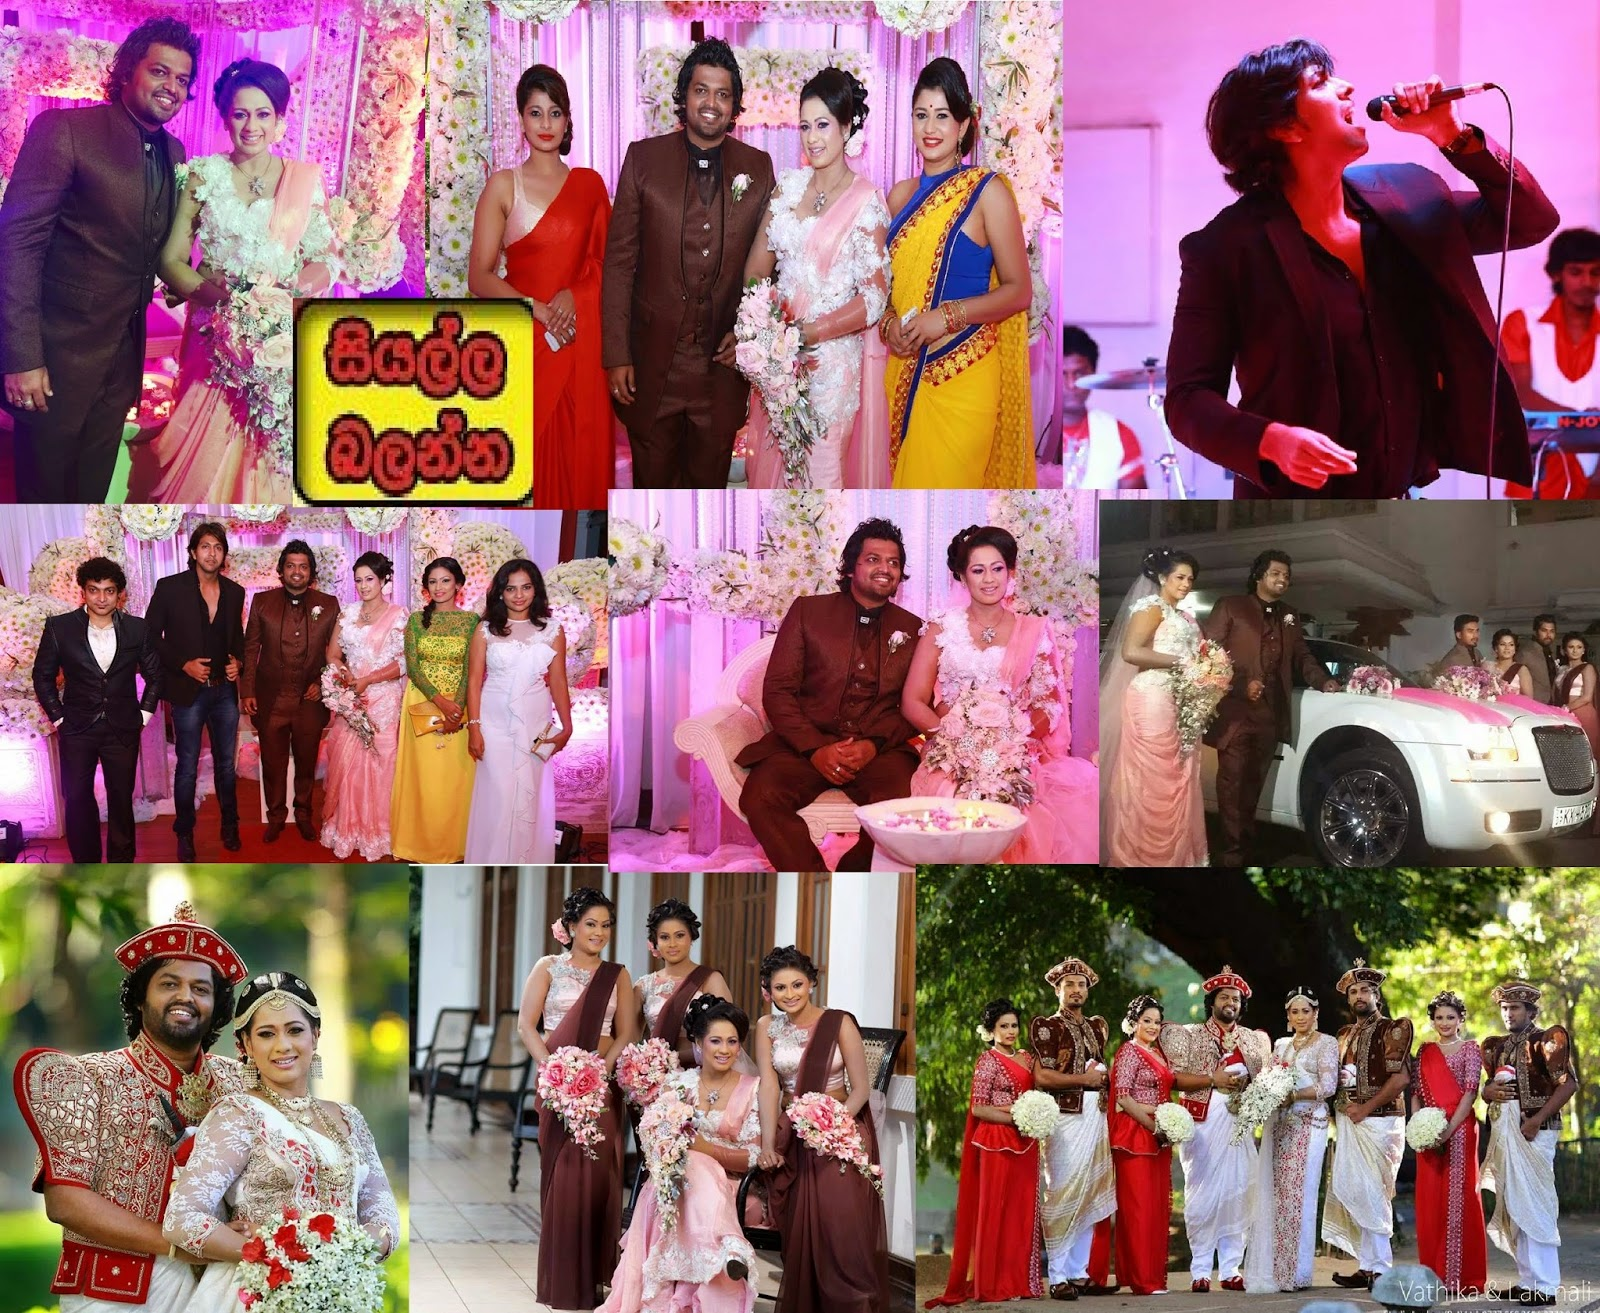 http://picture.gossiplankahotnews.com/2015/03/vathika-ravinath-lakmali-wedding.html